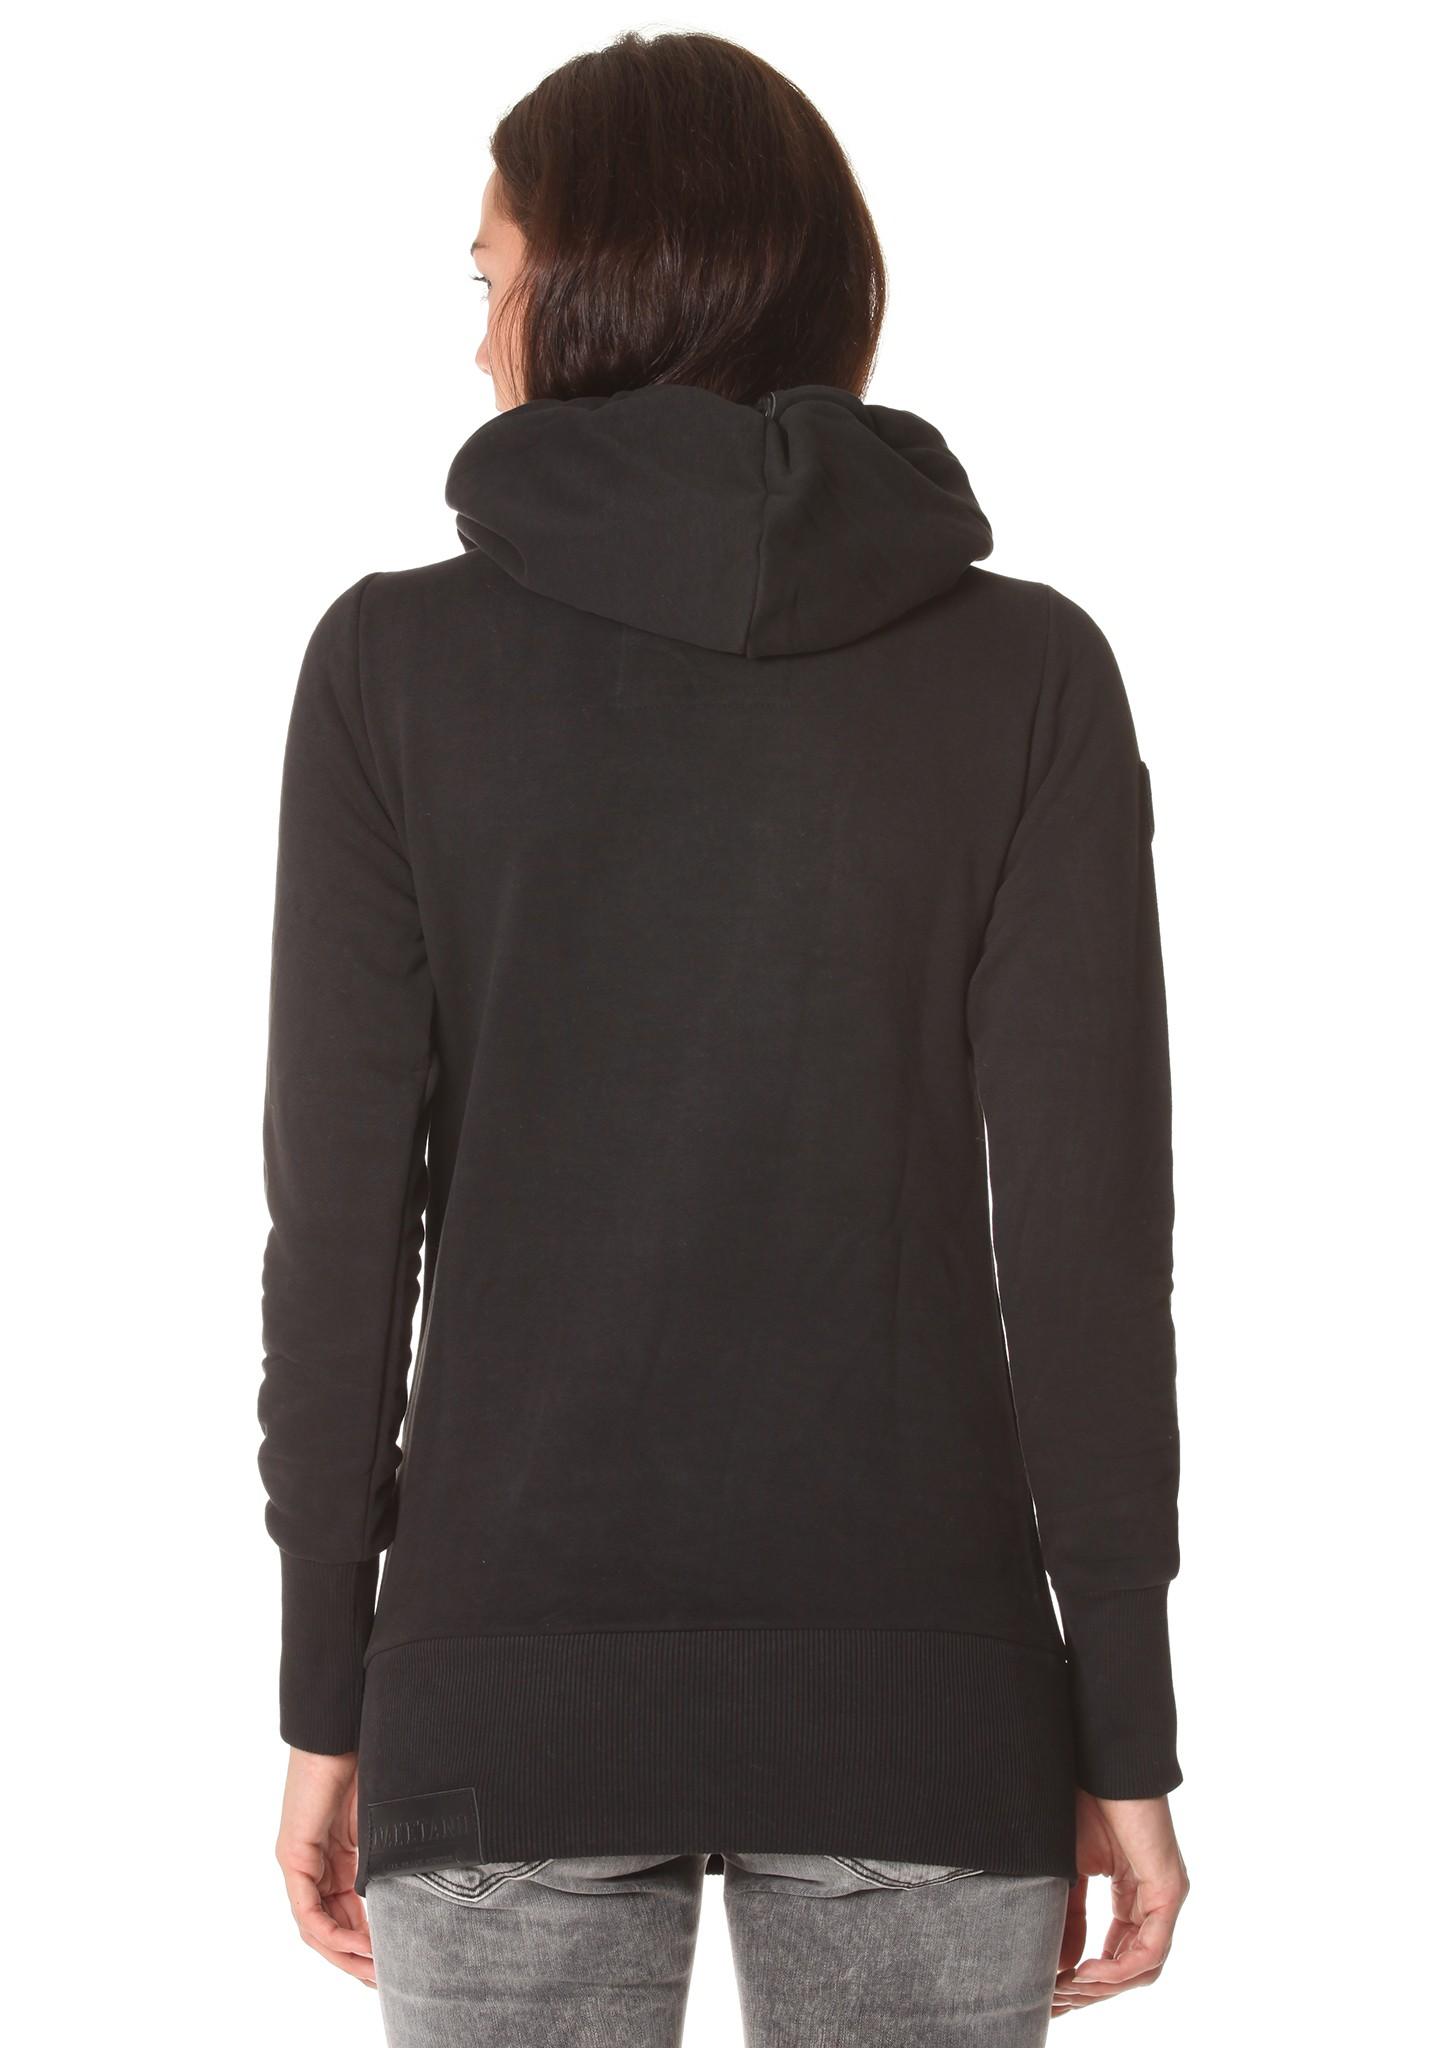 neu naketano darth long damen kapuzenpullover pullover hoodie kapuzenjacke ebay. Black Bedroom Furniture Sets. Home Design Ideas